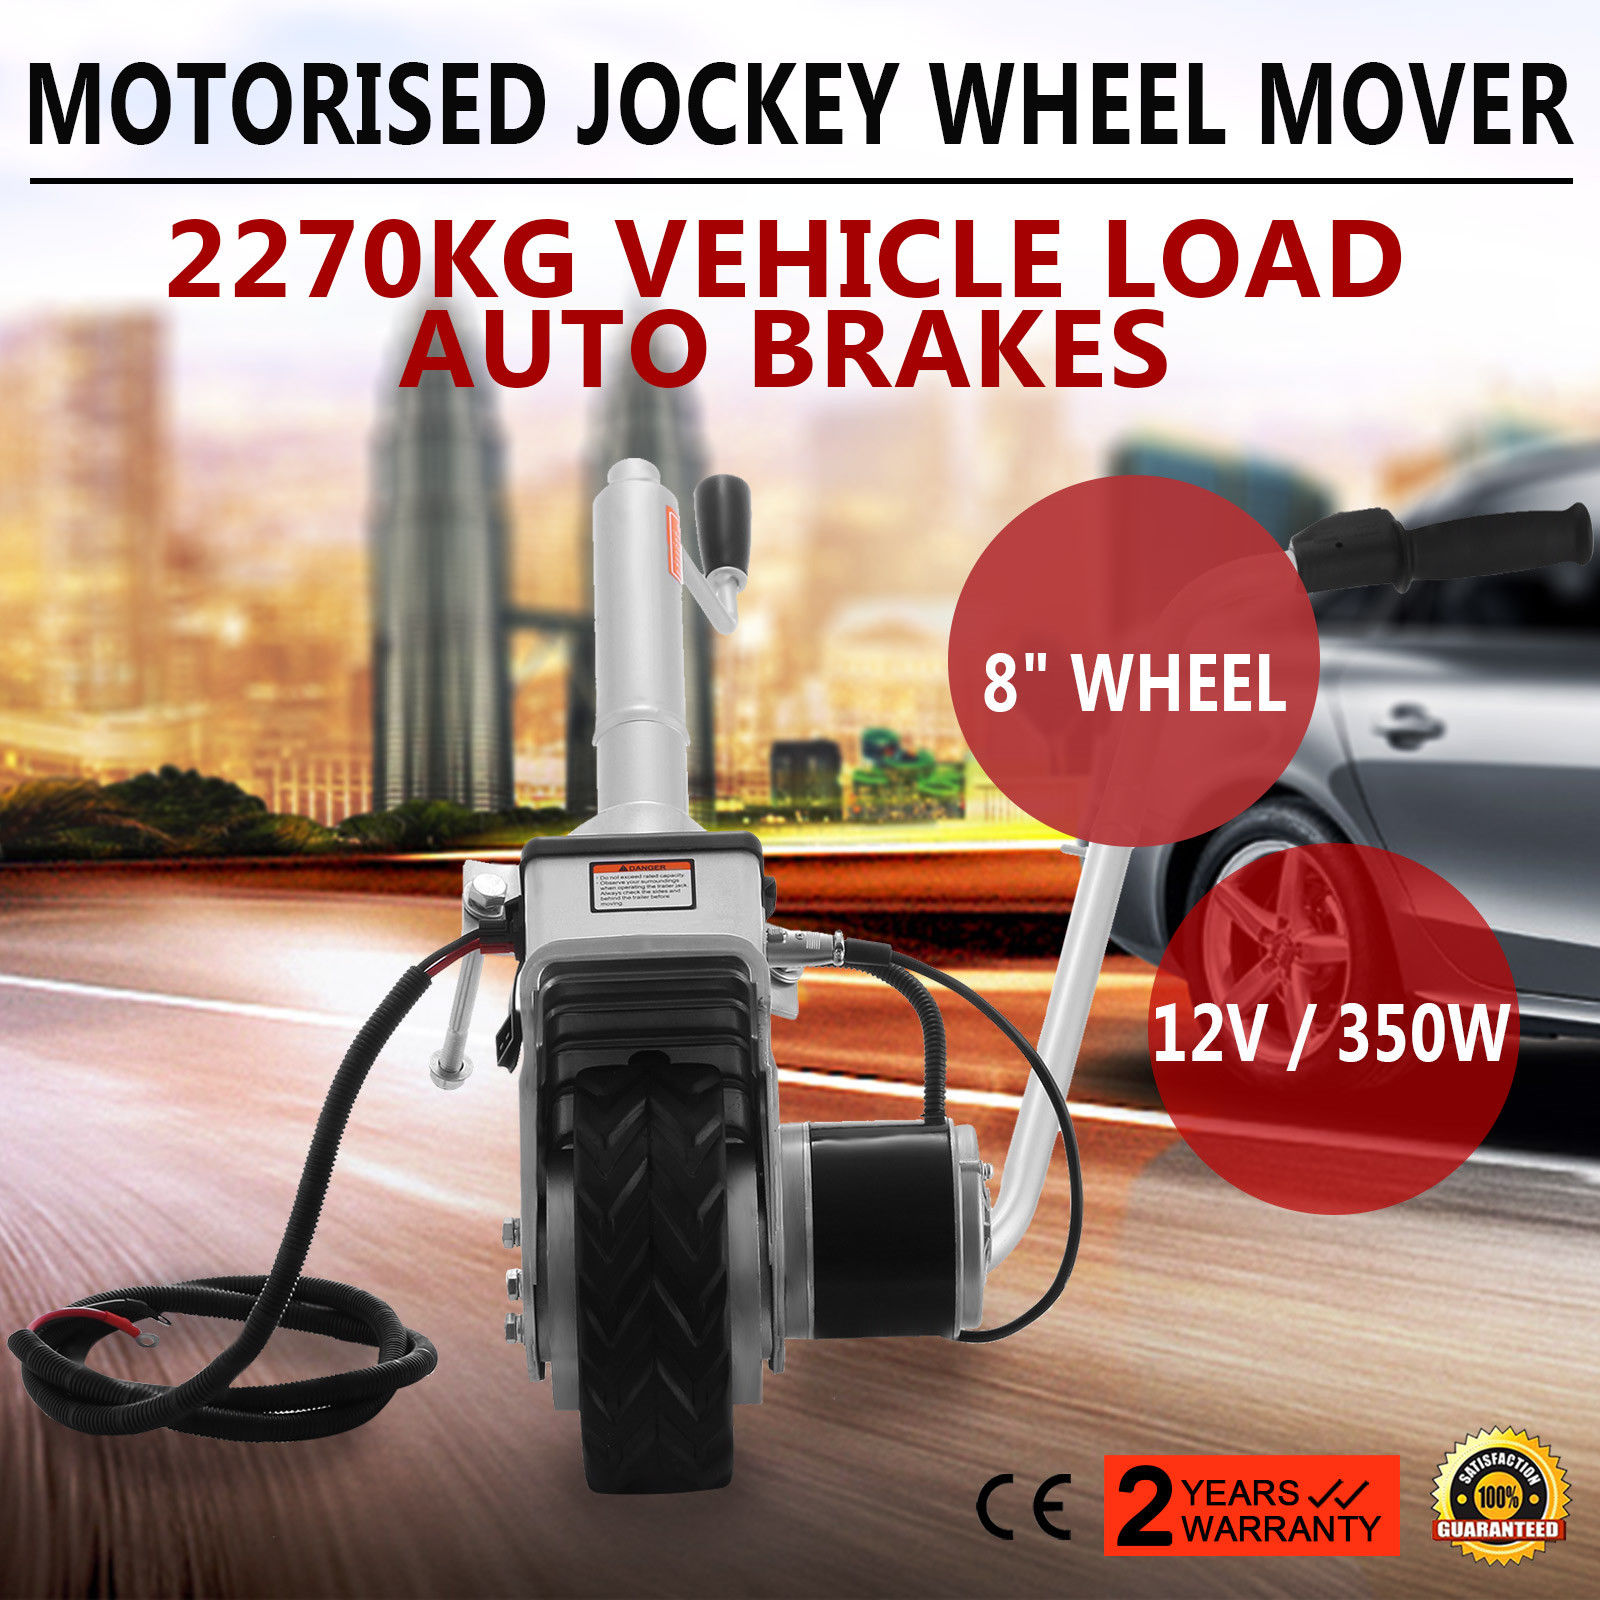 Моторизованный трейлер Jockey Wheel 12v Mover Электрический Караван Лодка Долли авто тормоз